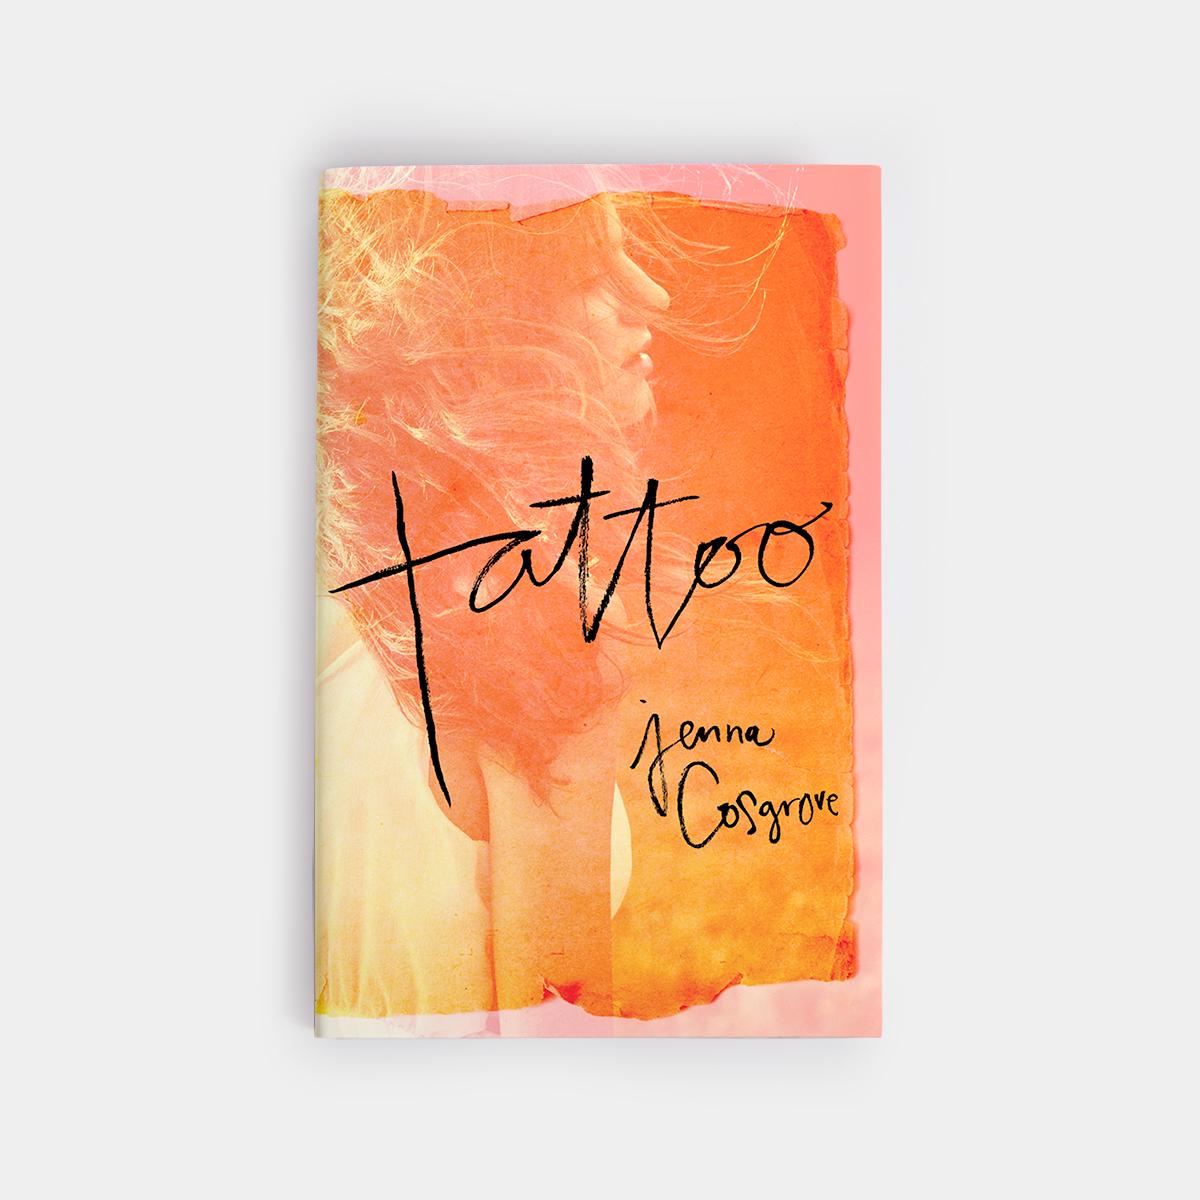 Tattoo - annadorfman.com